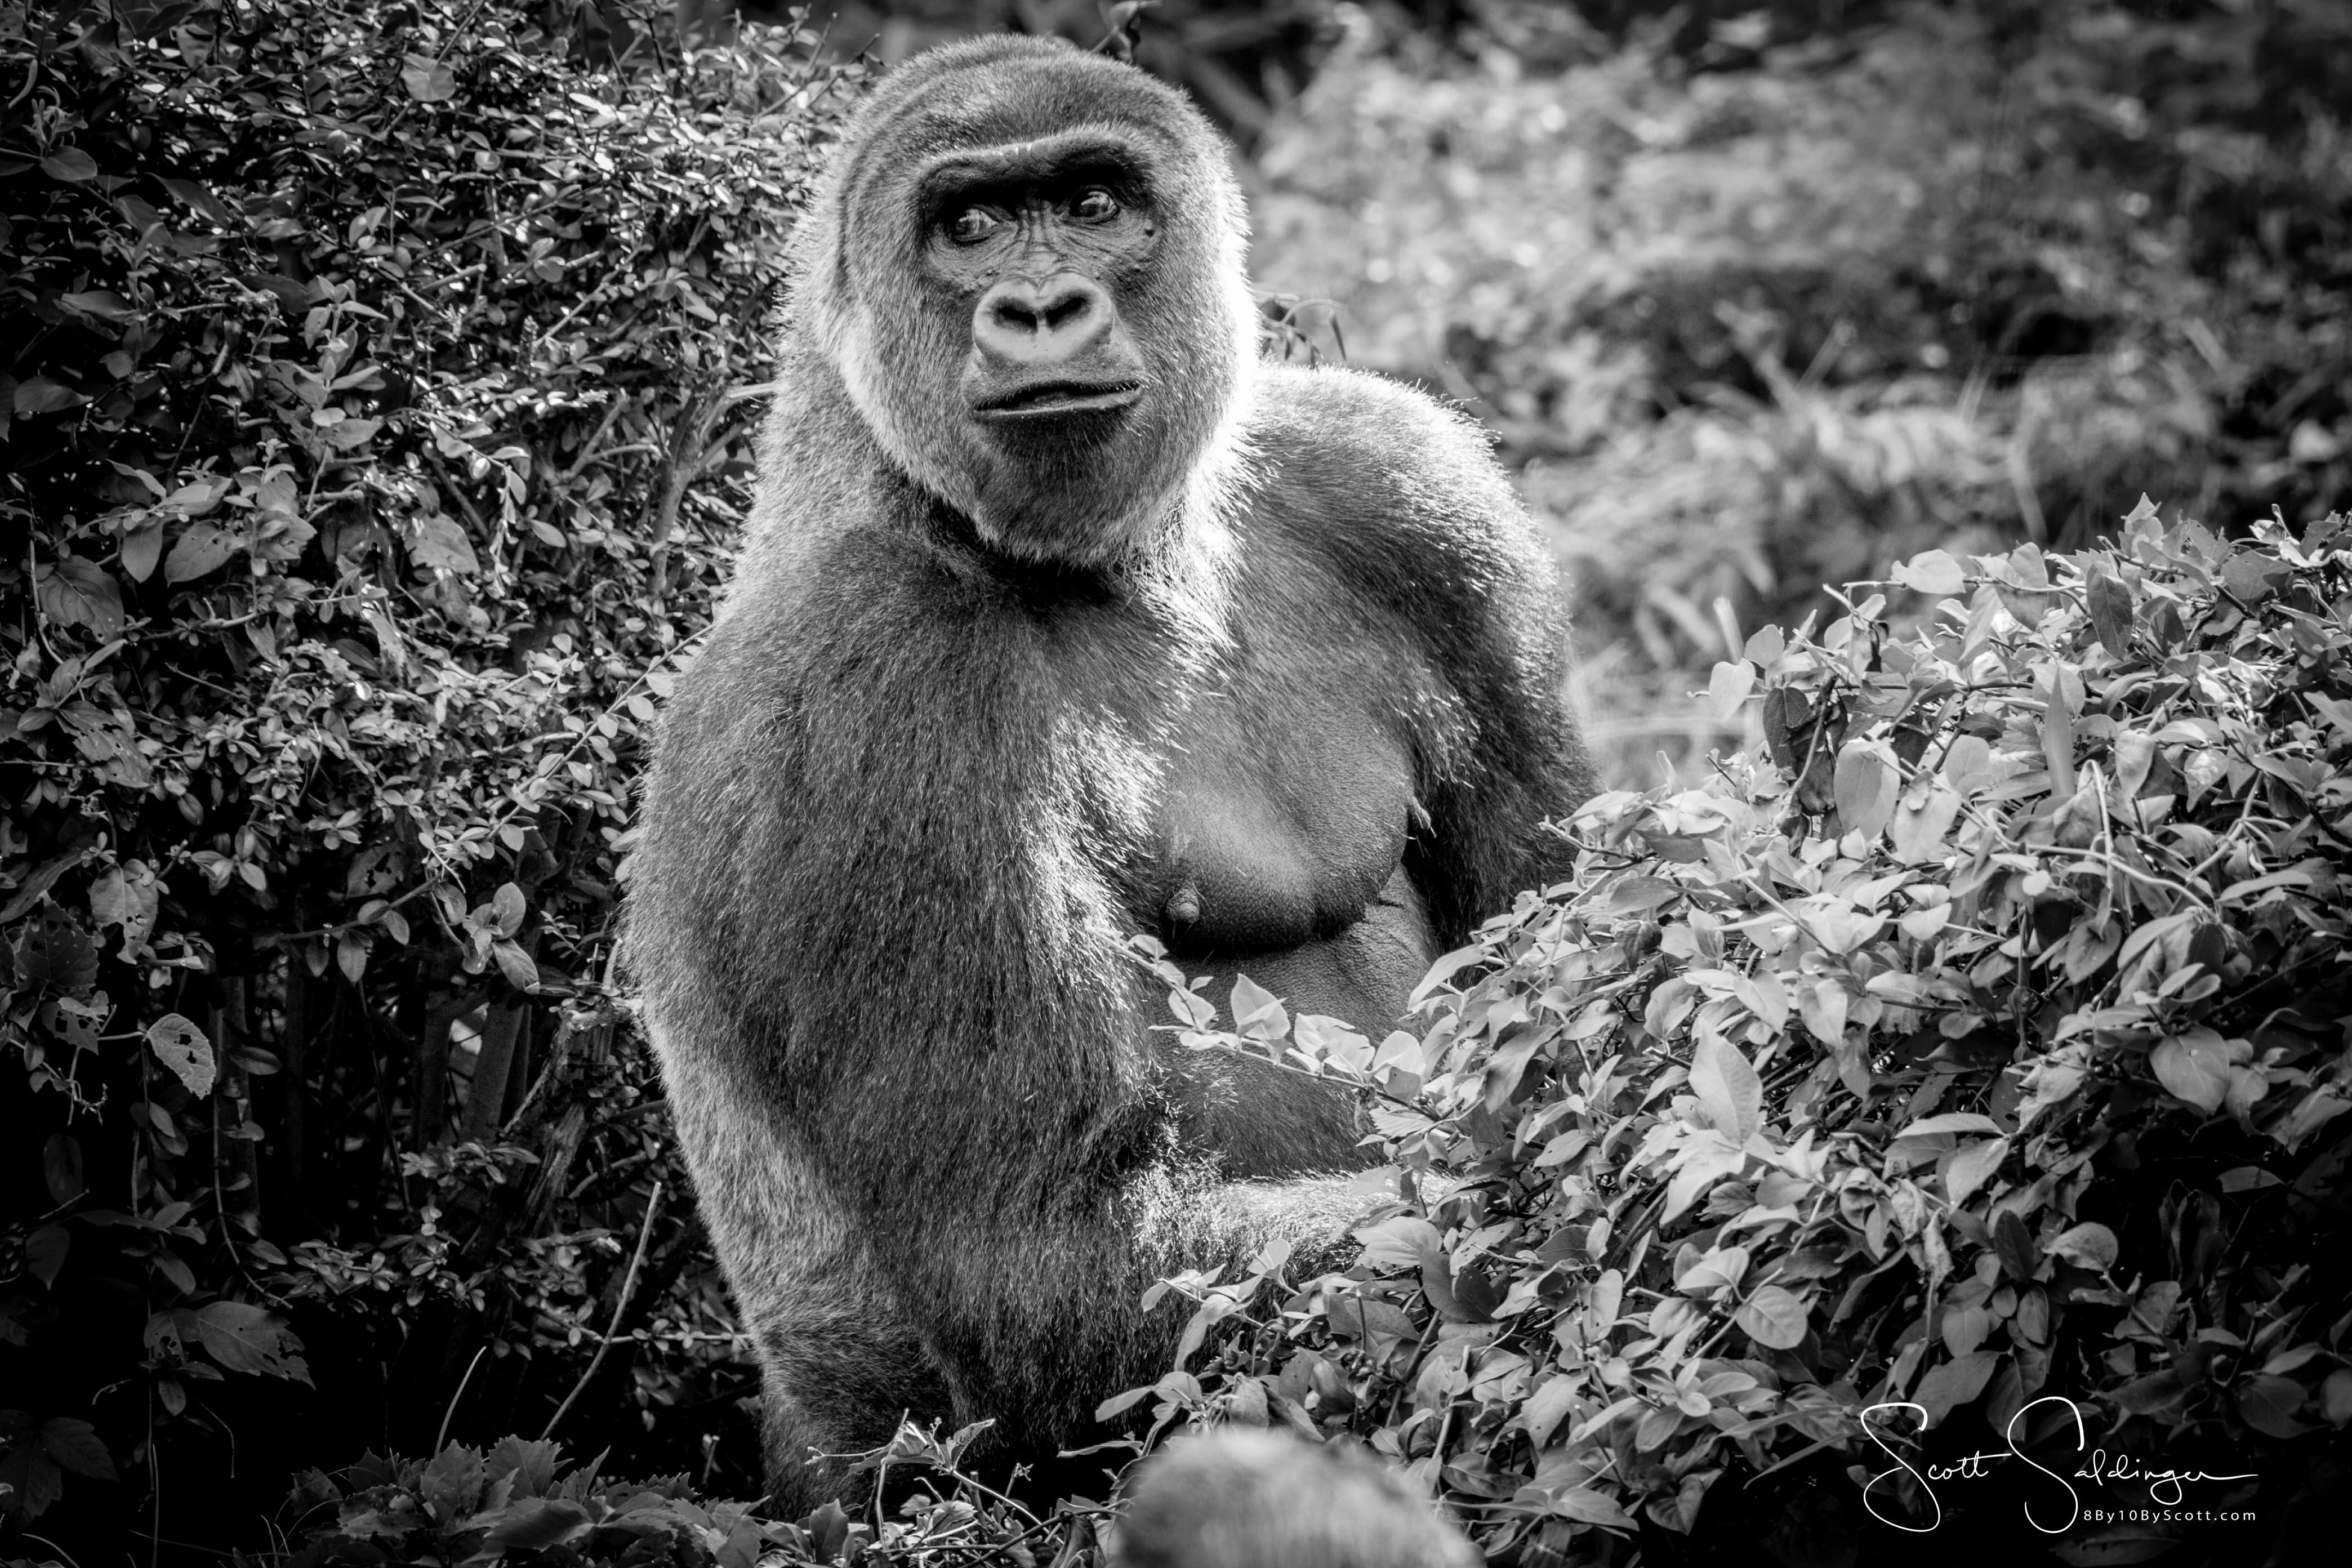 Apes-5603